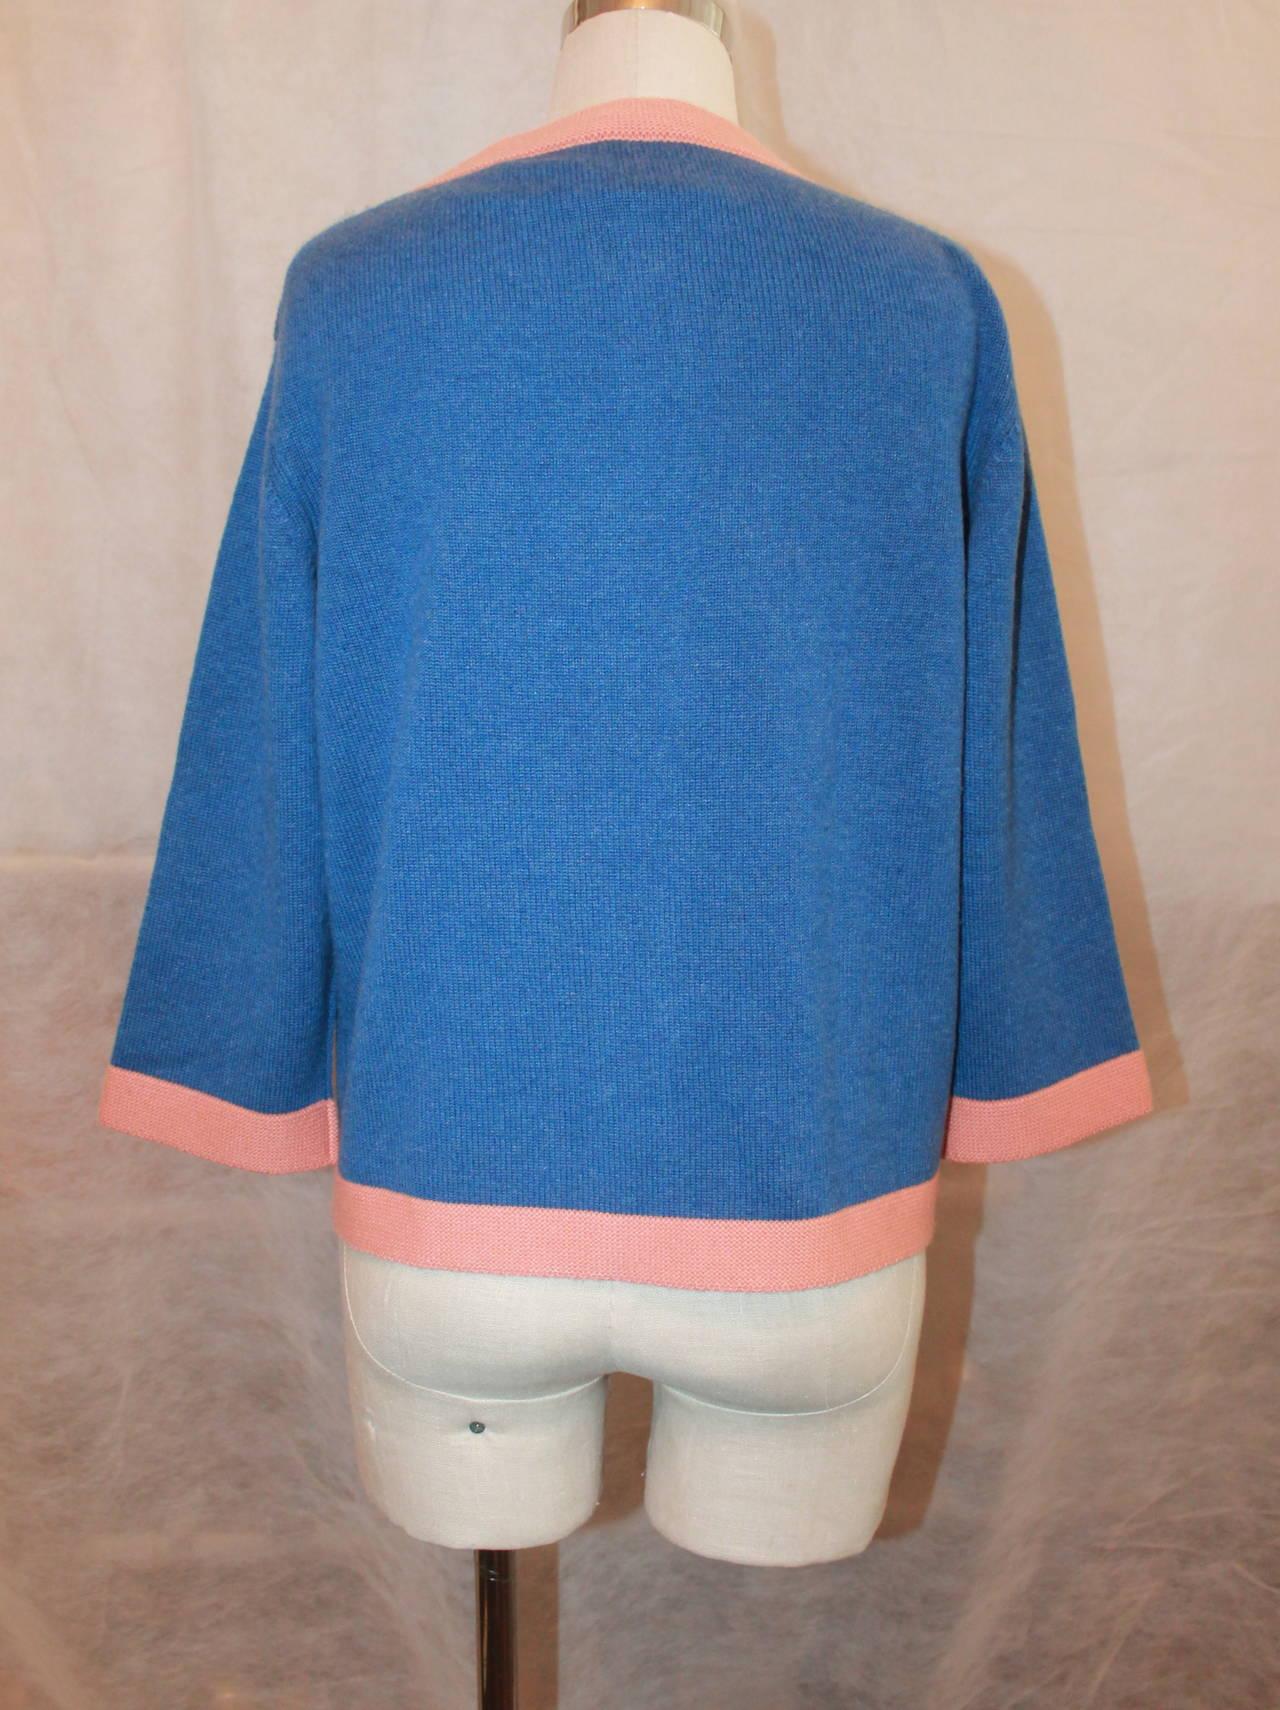 Chanel 2007 Blue & Peach Cashmere Sweater - 46 5